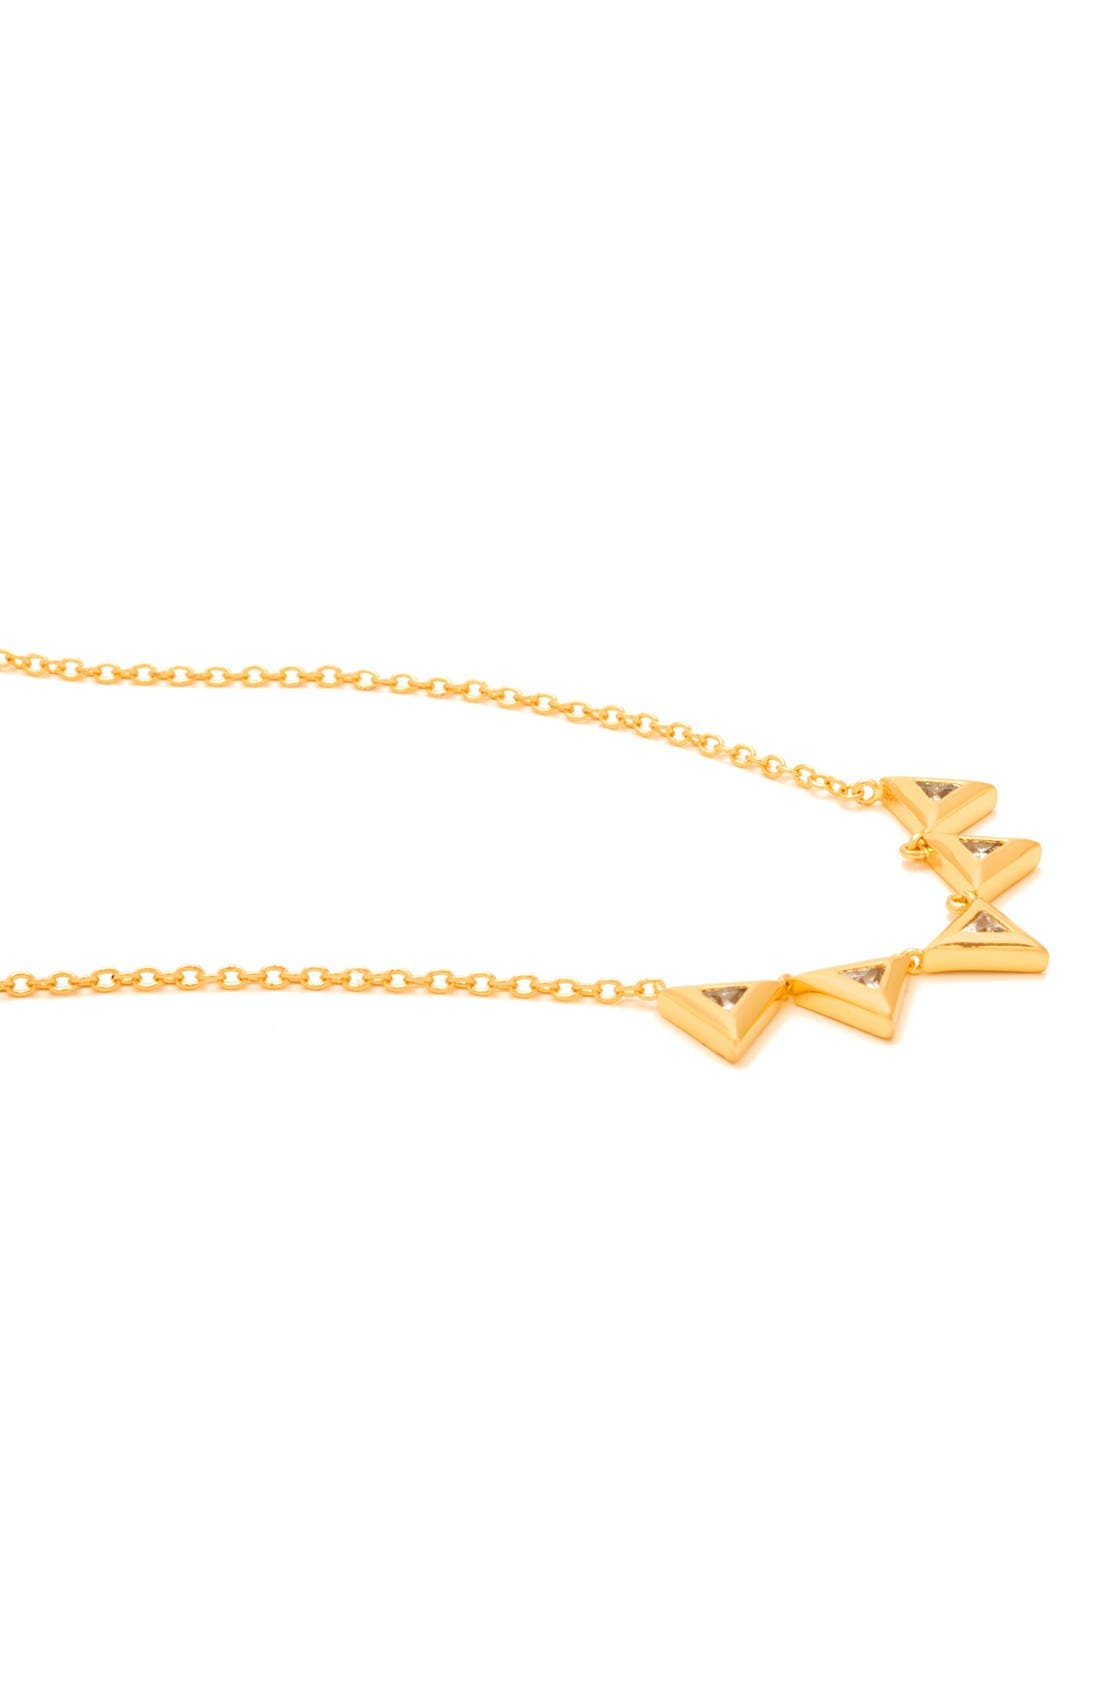 Alternate Image 3  - gorjana 'Vivienne' Pendant Necklace